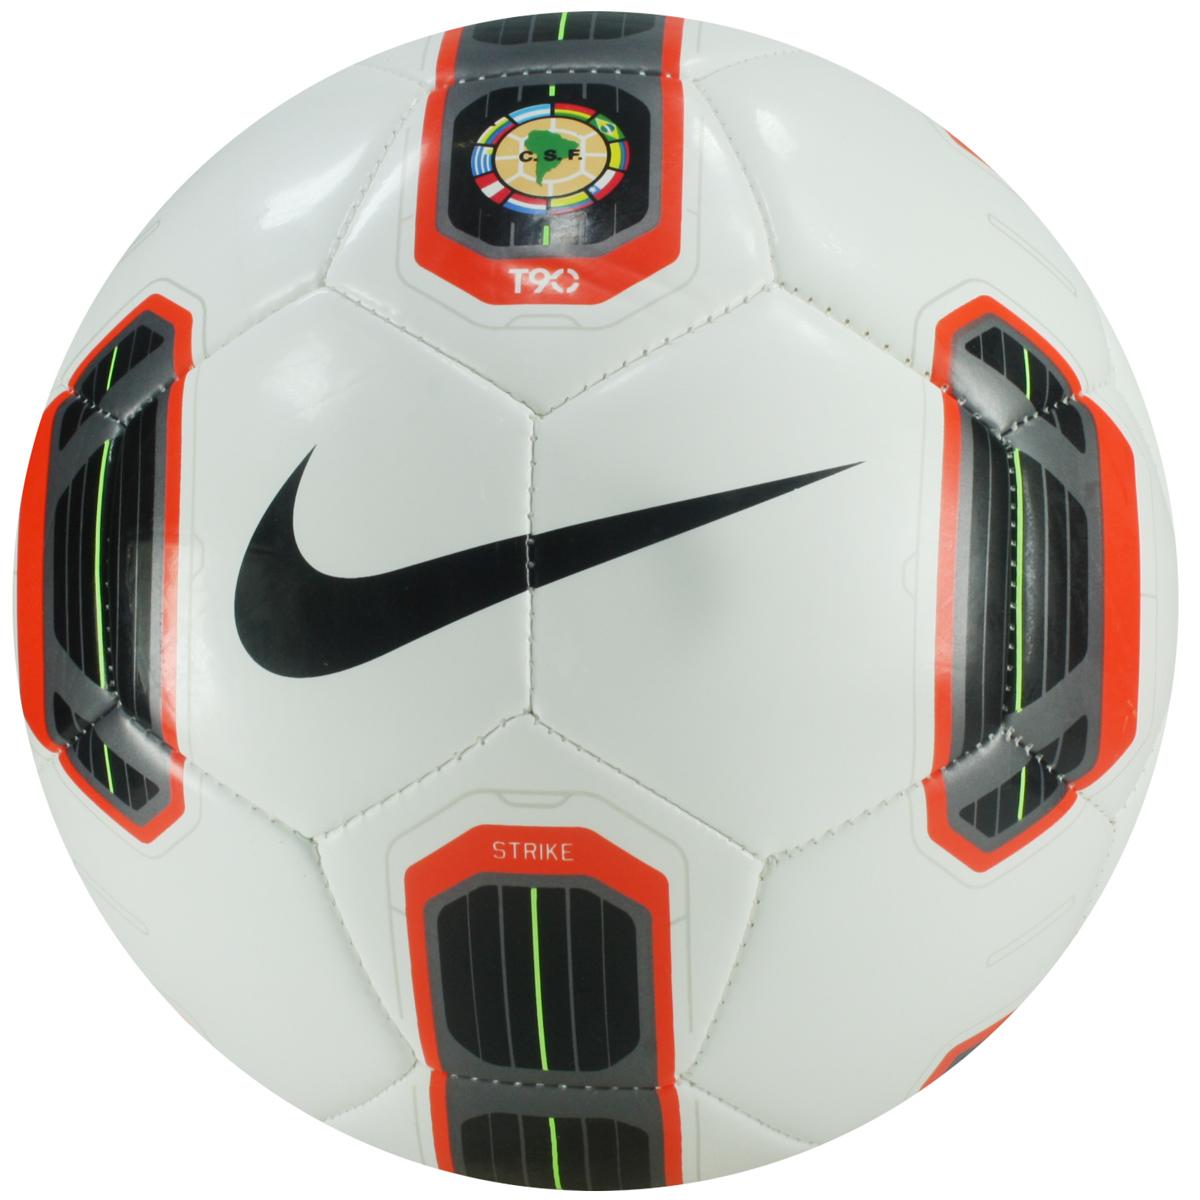 21a9bfec7a Peralatan Sepak Bola Lengkap — brad.erva-doce.info